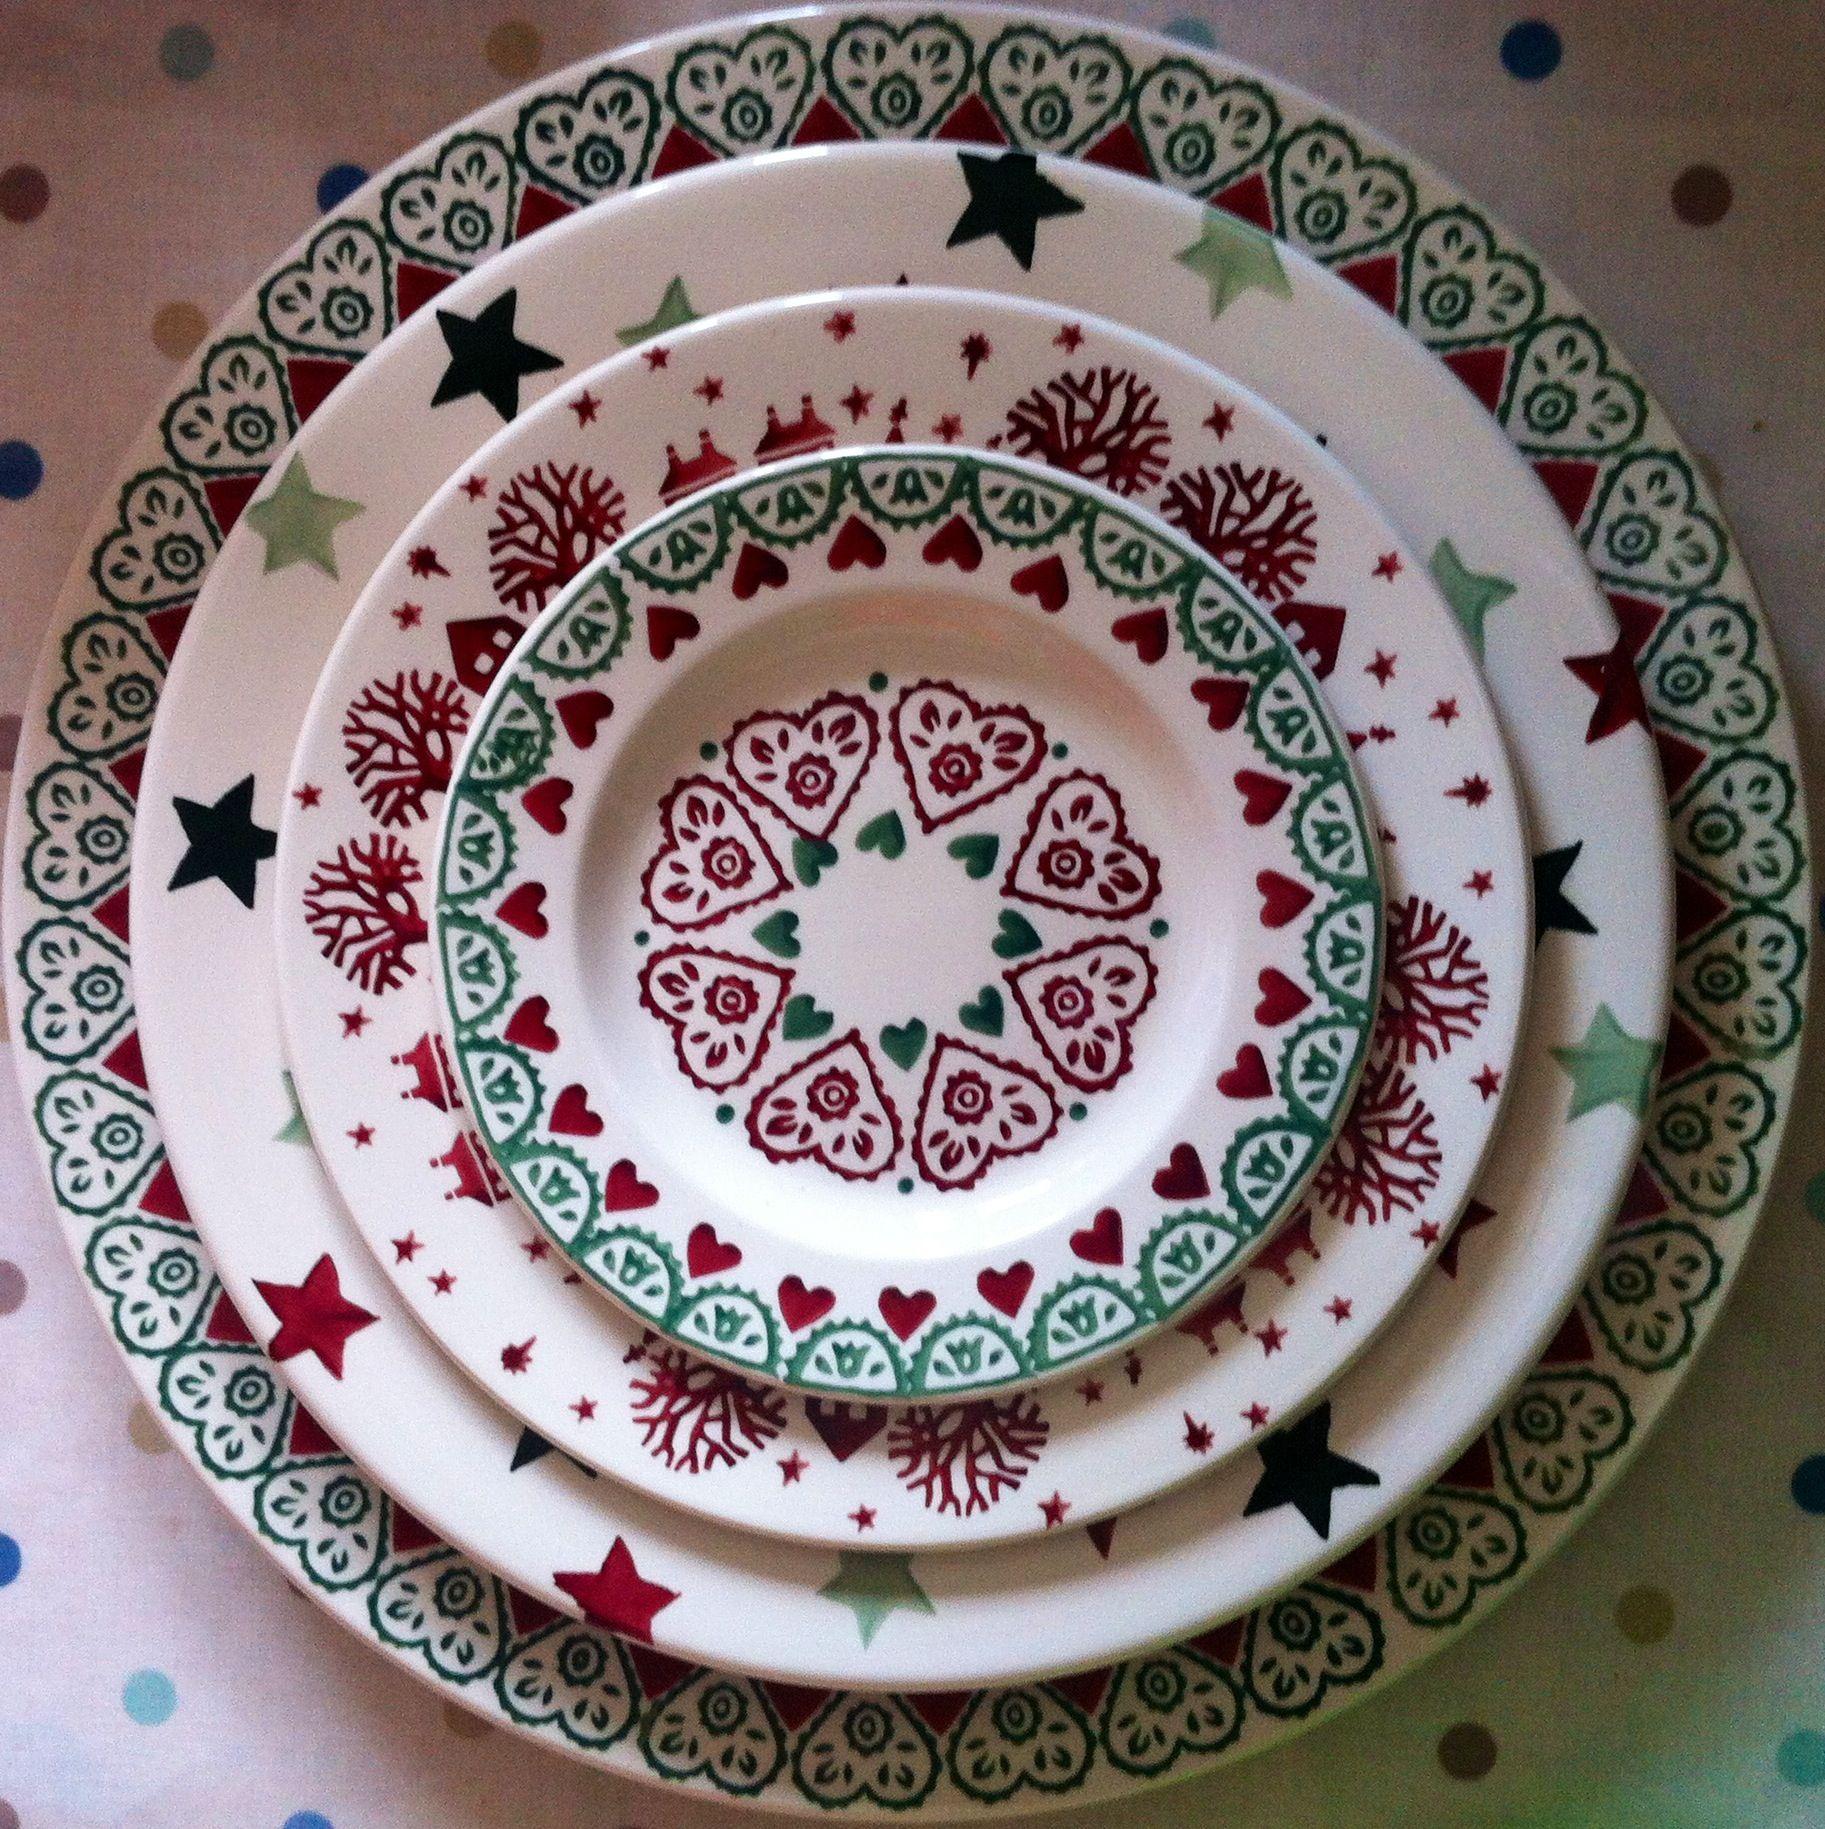 A Little Bit Of Emma Bridgewater Christmas Dinnerware Emma Bridgewater Pottery Christmas Plates